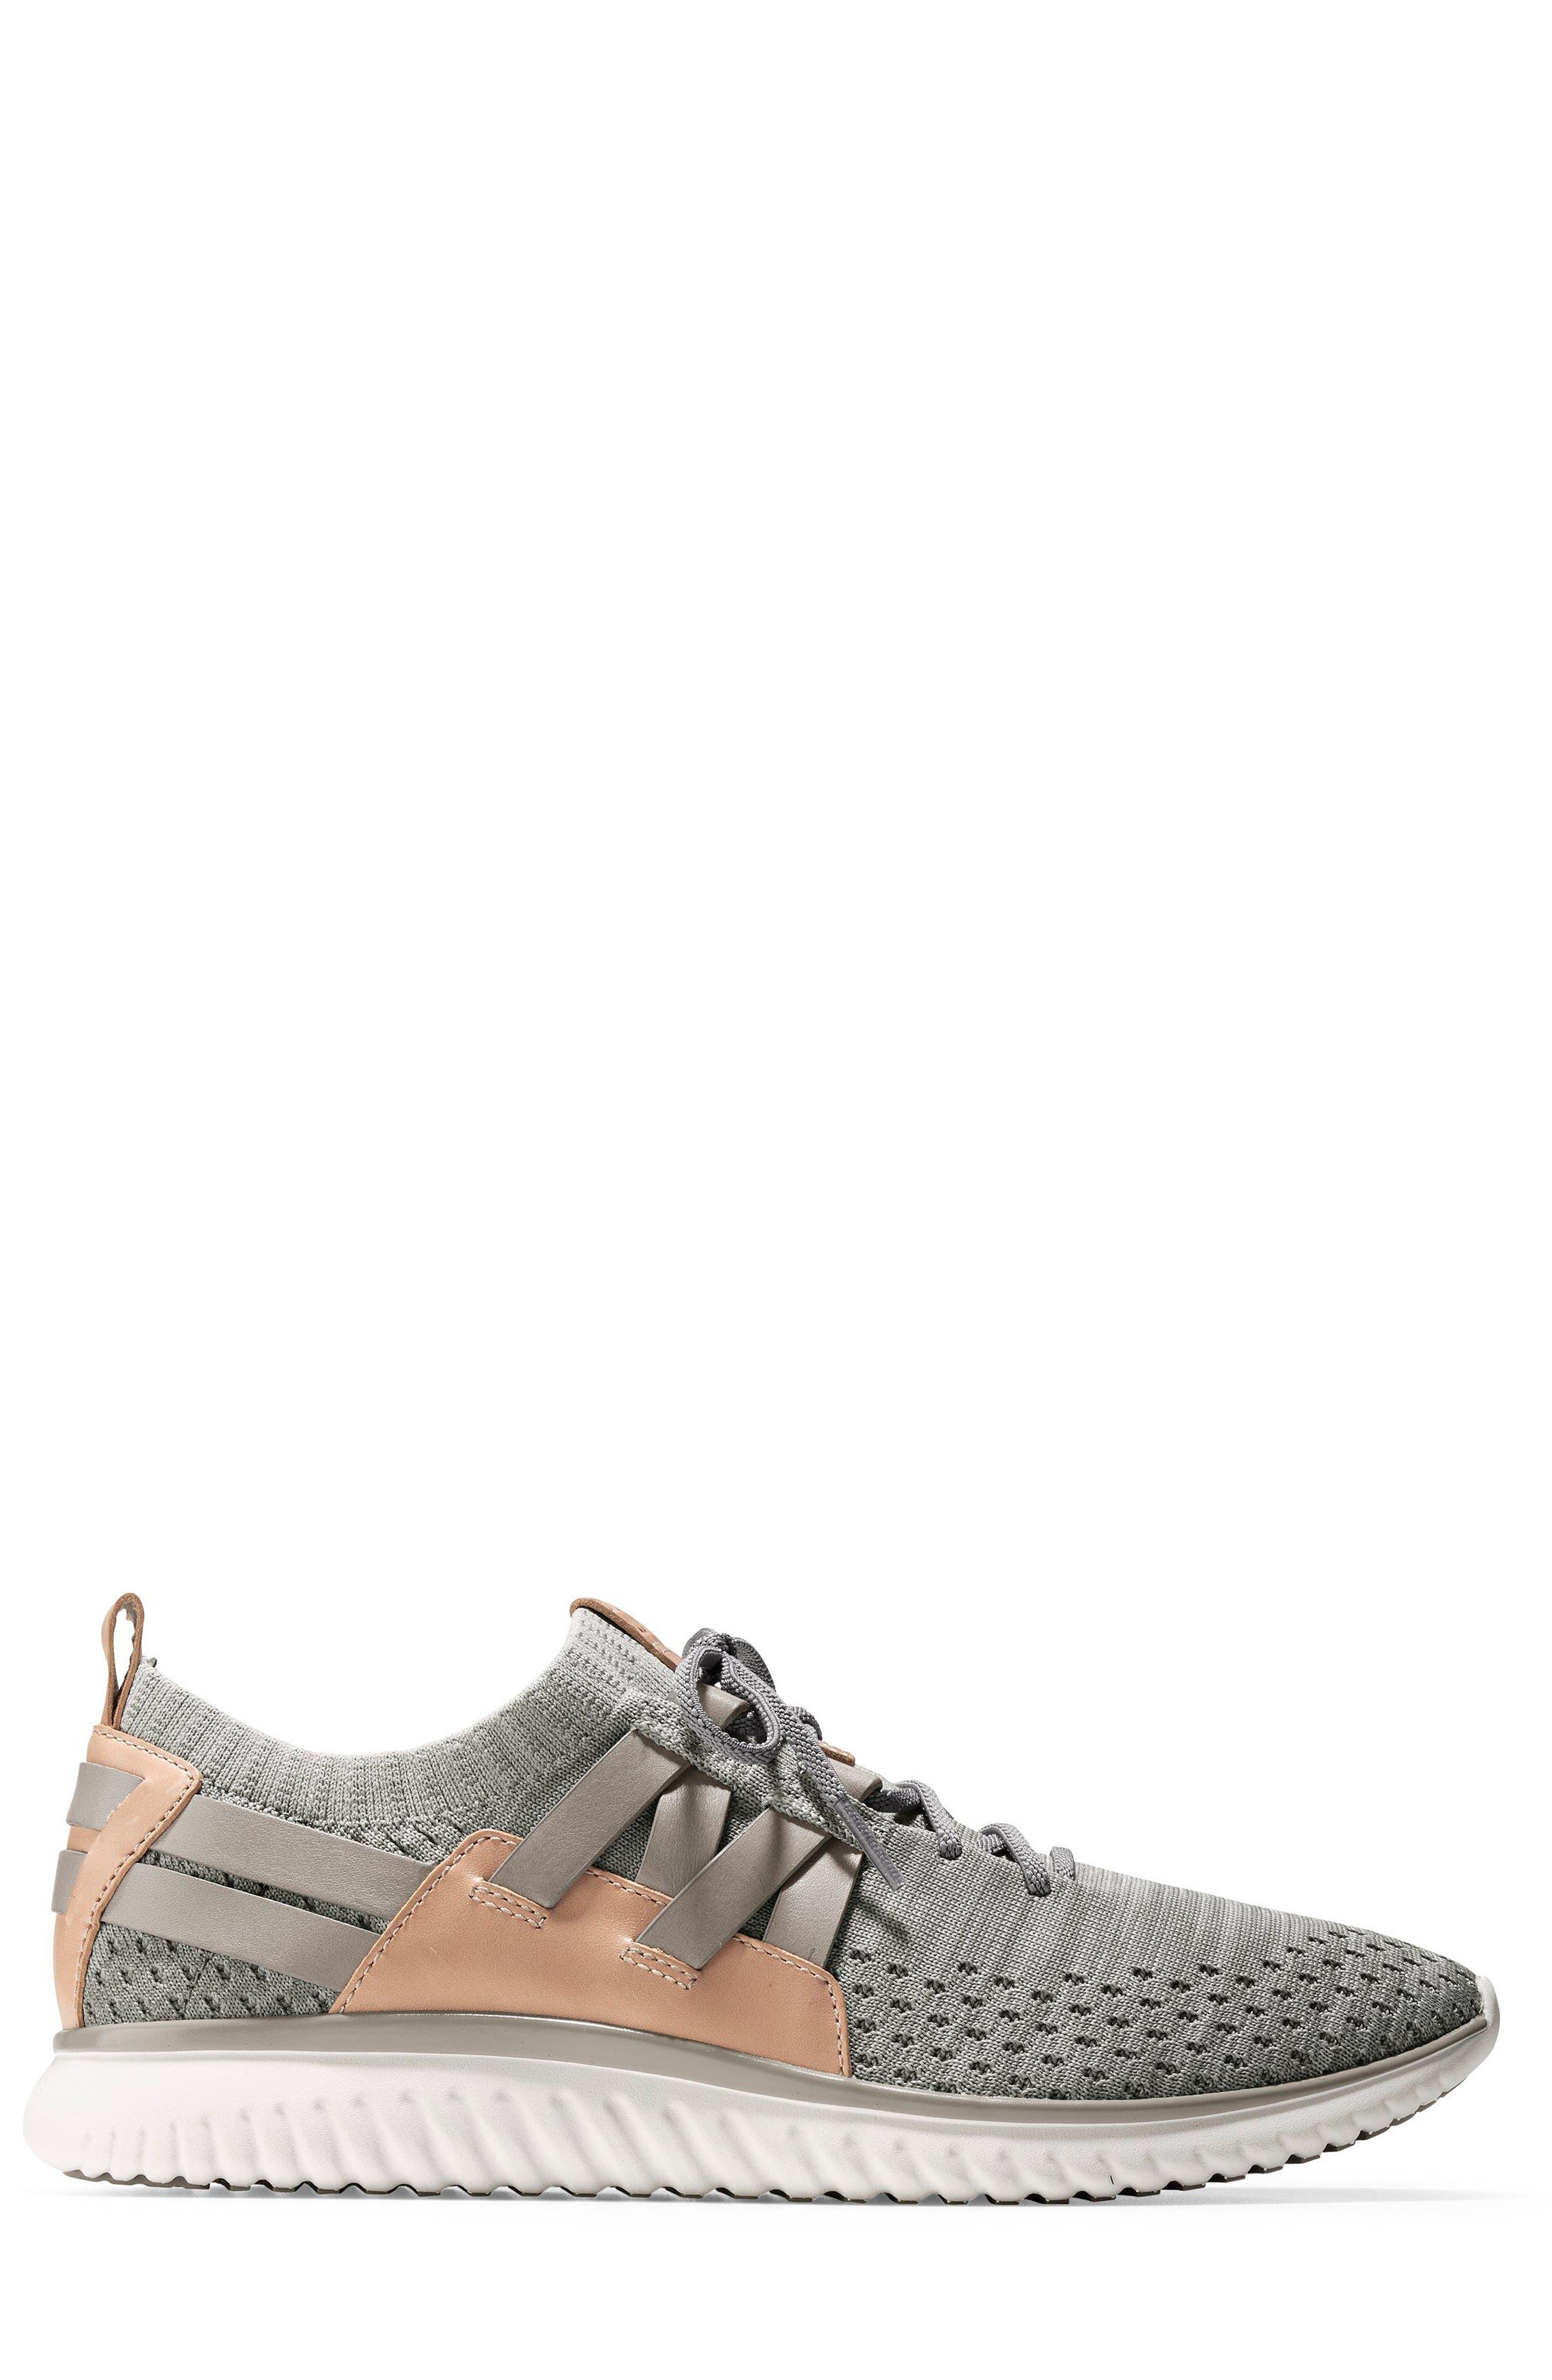 Grand Motion Sneaker,                             Alternate thumbnail 3, color,                             Rockridge/ Ivory